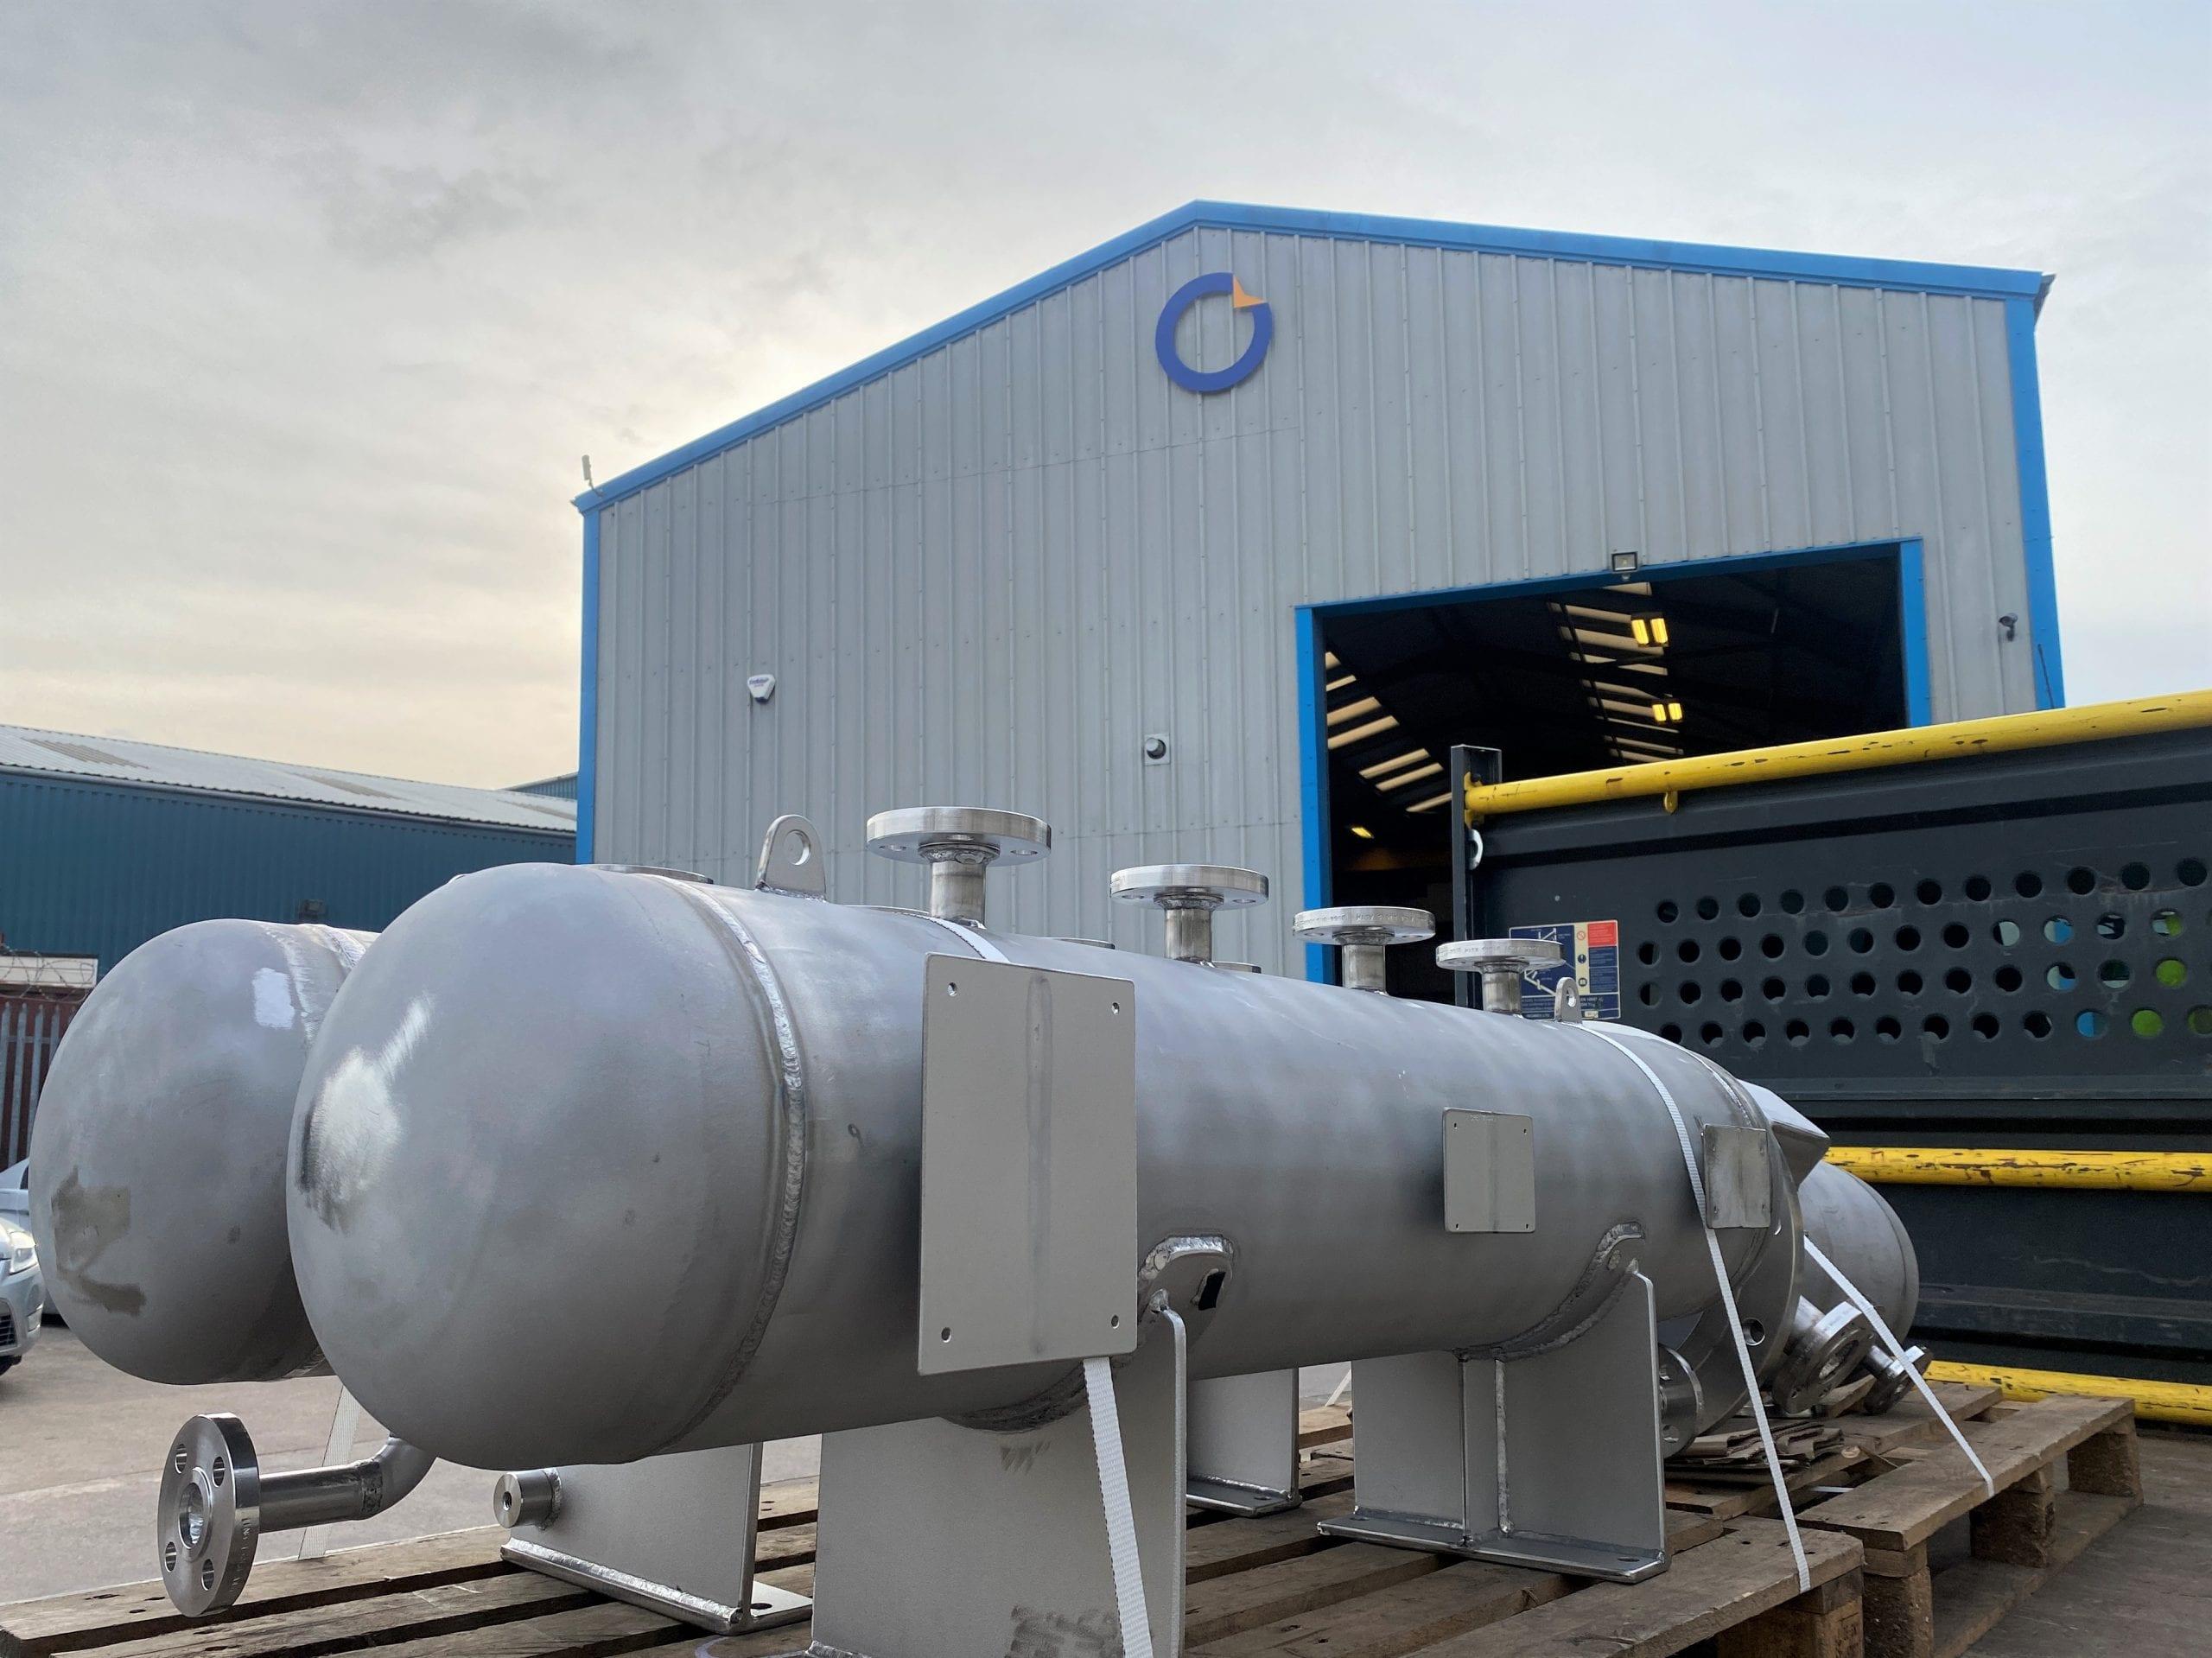 Hastelloy C22 Pressure vessel designed to EN13445